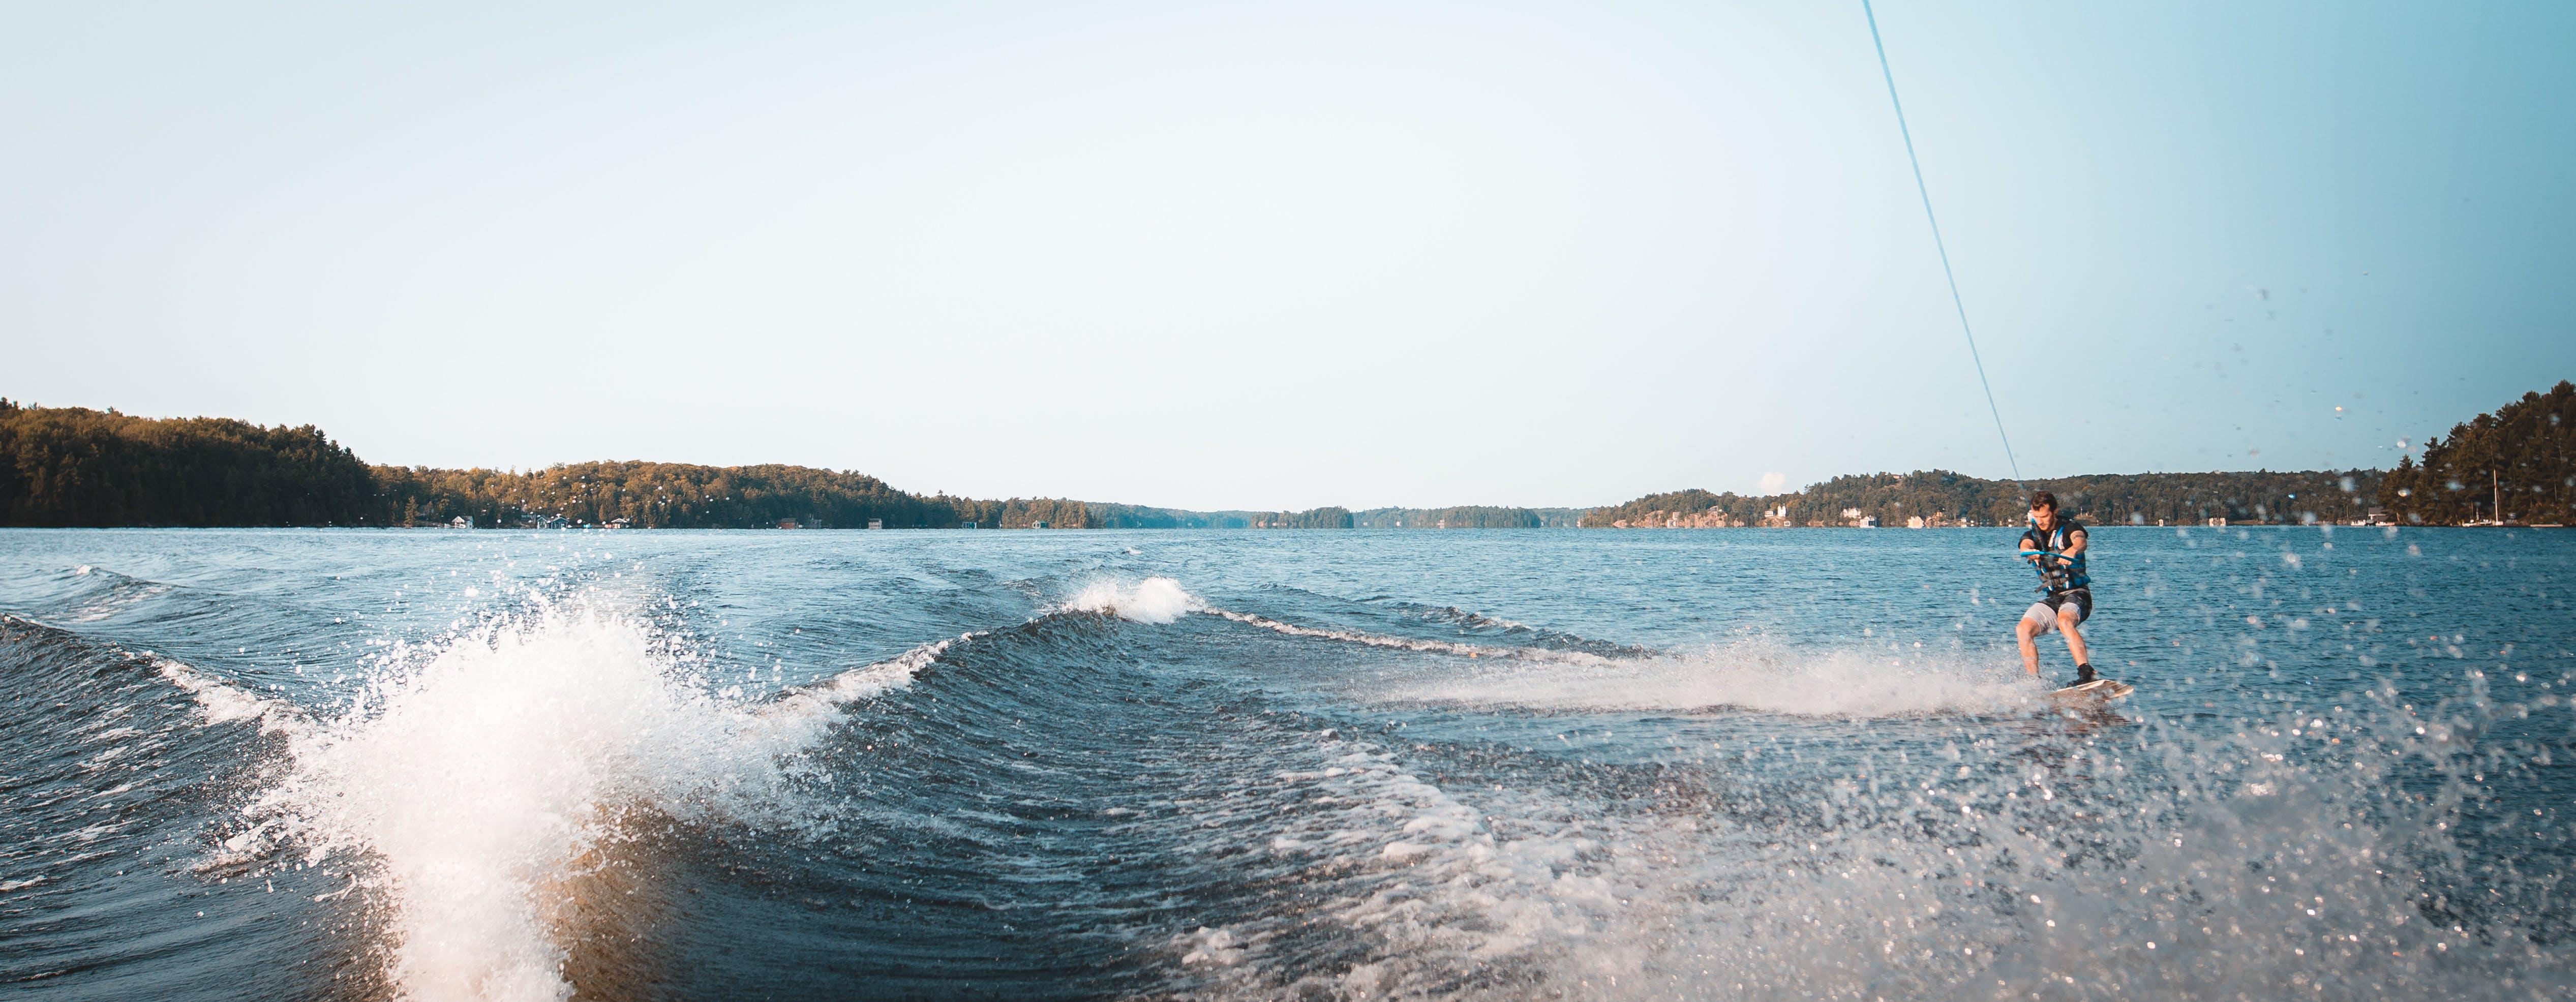 Free stock photo of boat, canada, lake, wakeboard